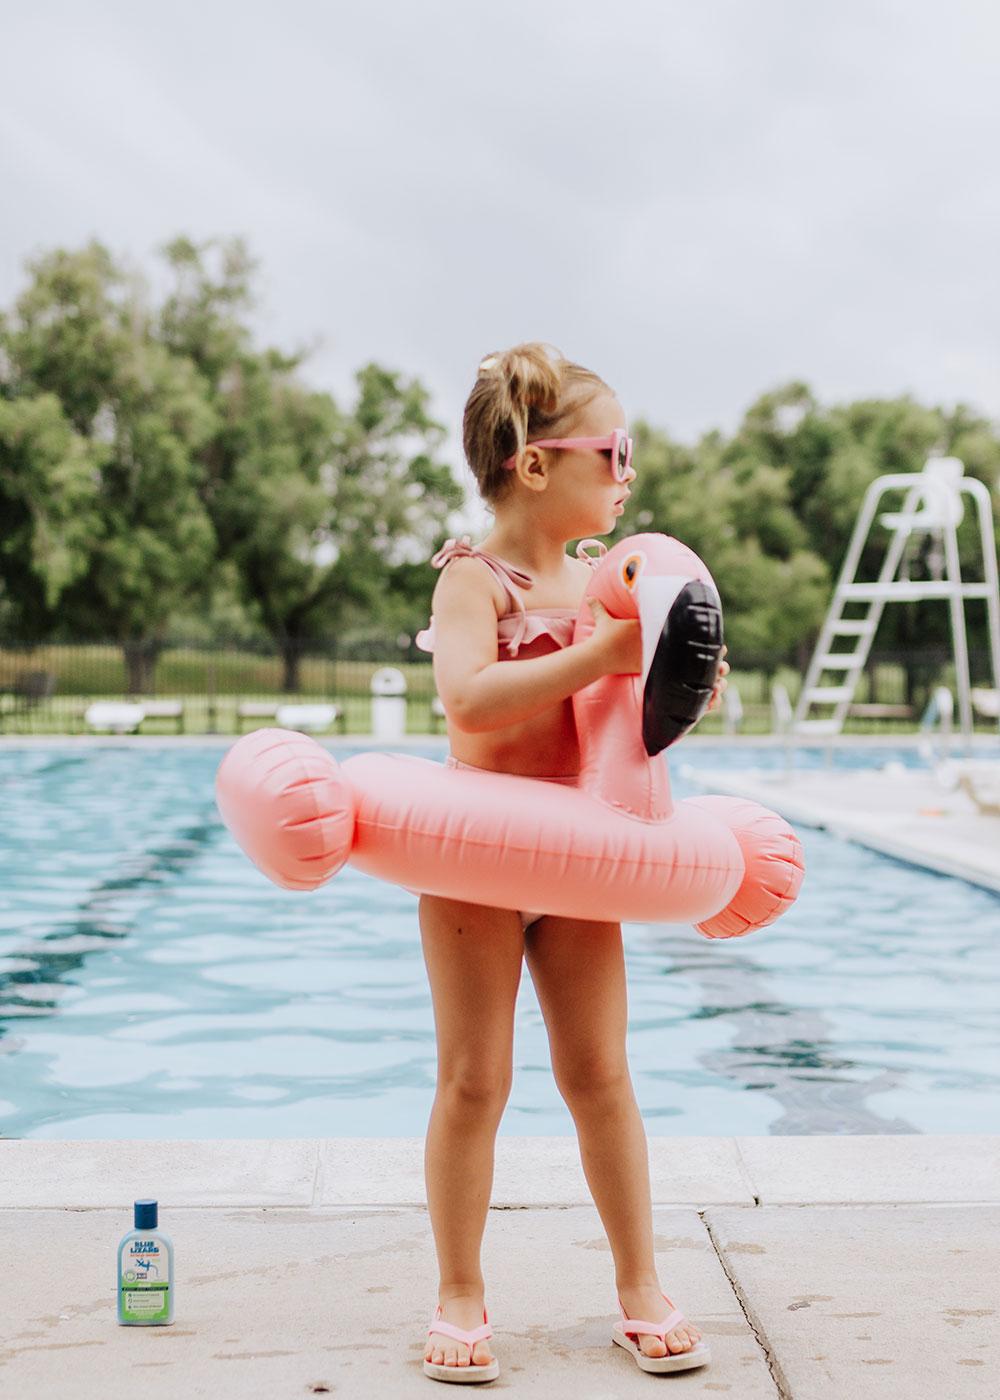 summer sun ready with Blue Lizard Australian Sunscreen. available on Amazon!   thelovedesignedlife.com #summer #sunscreen #naturalsunscreen #safesunscreen